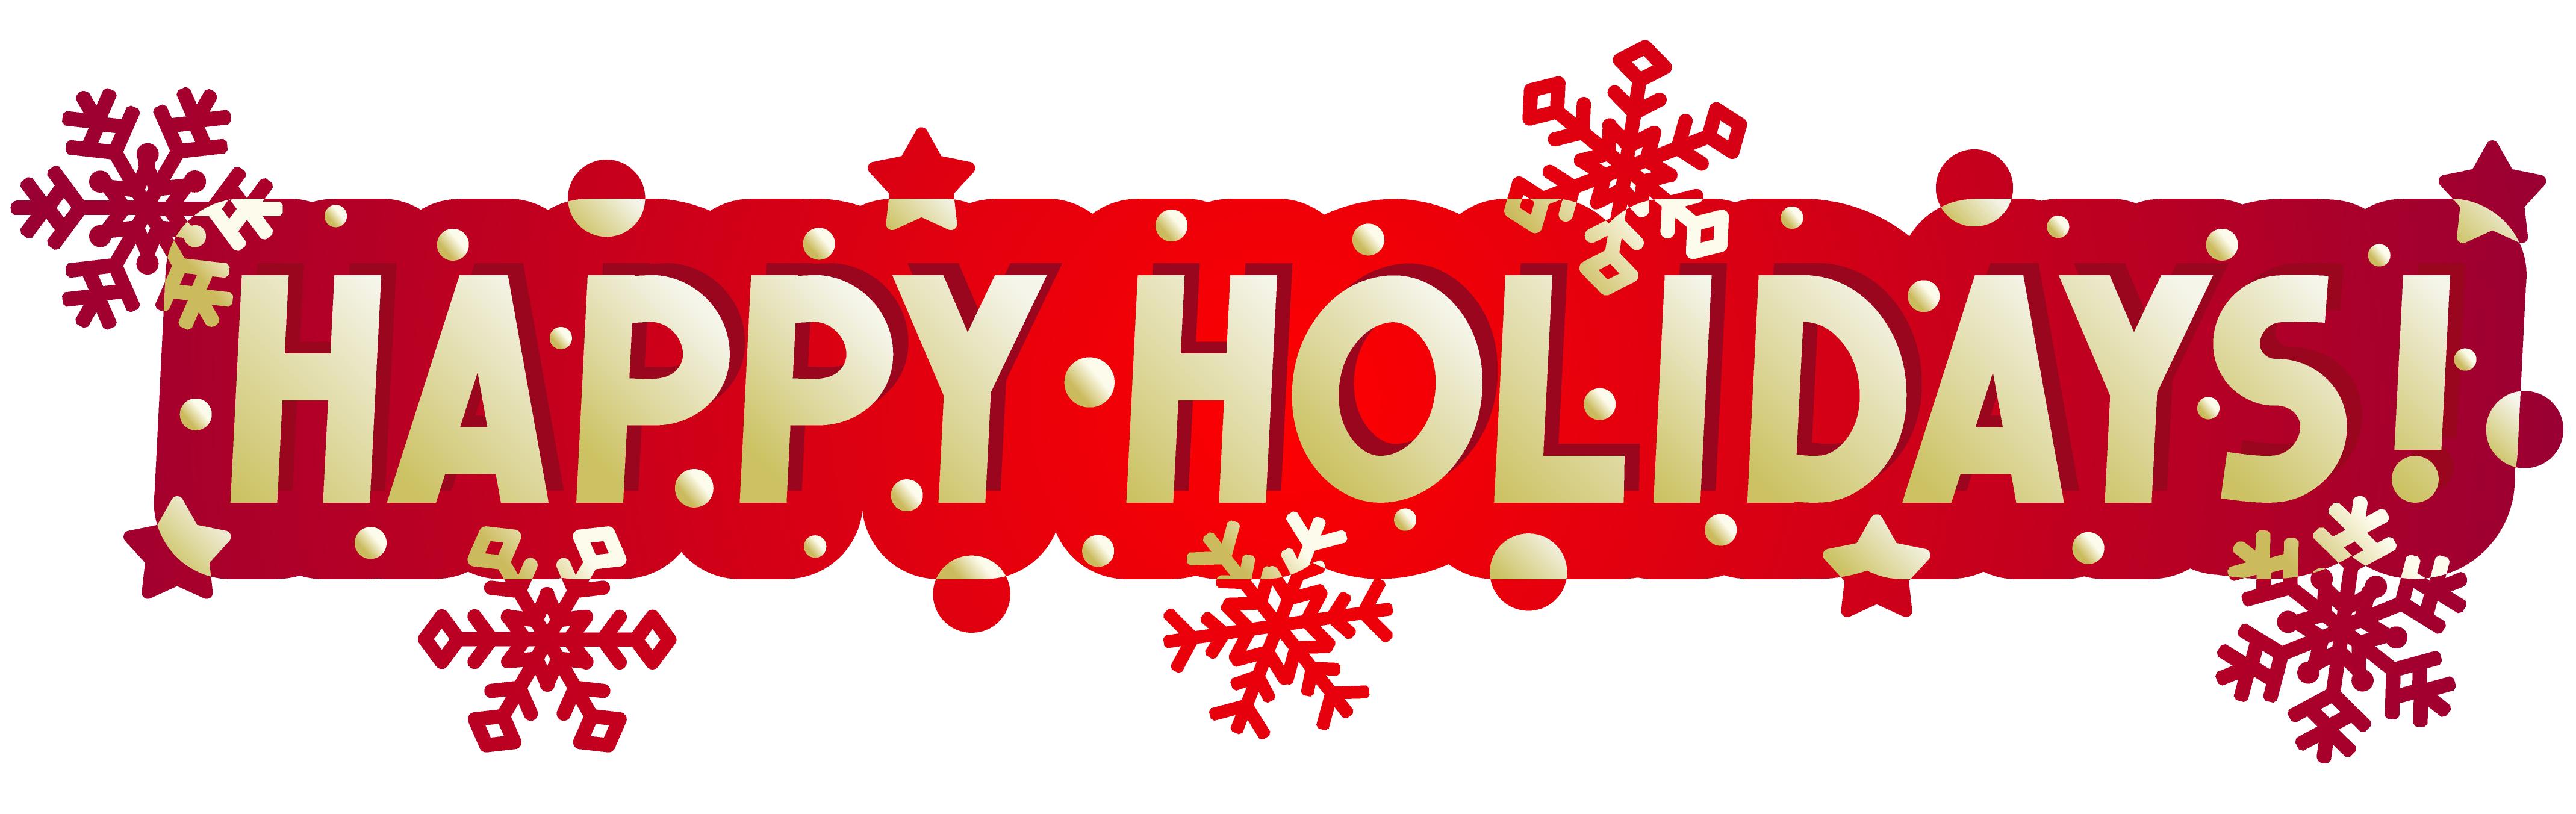 happy holidays clip art . Facebook ... Happy holidays .